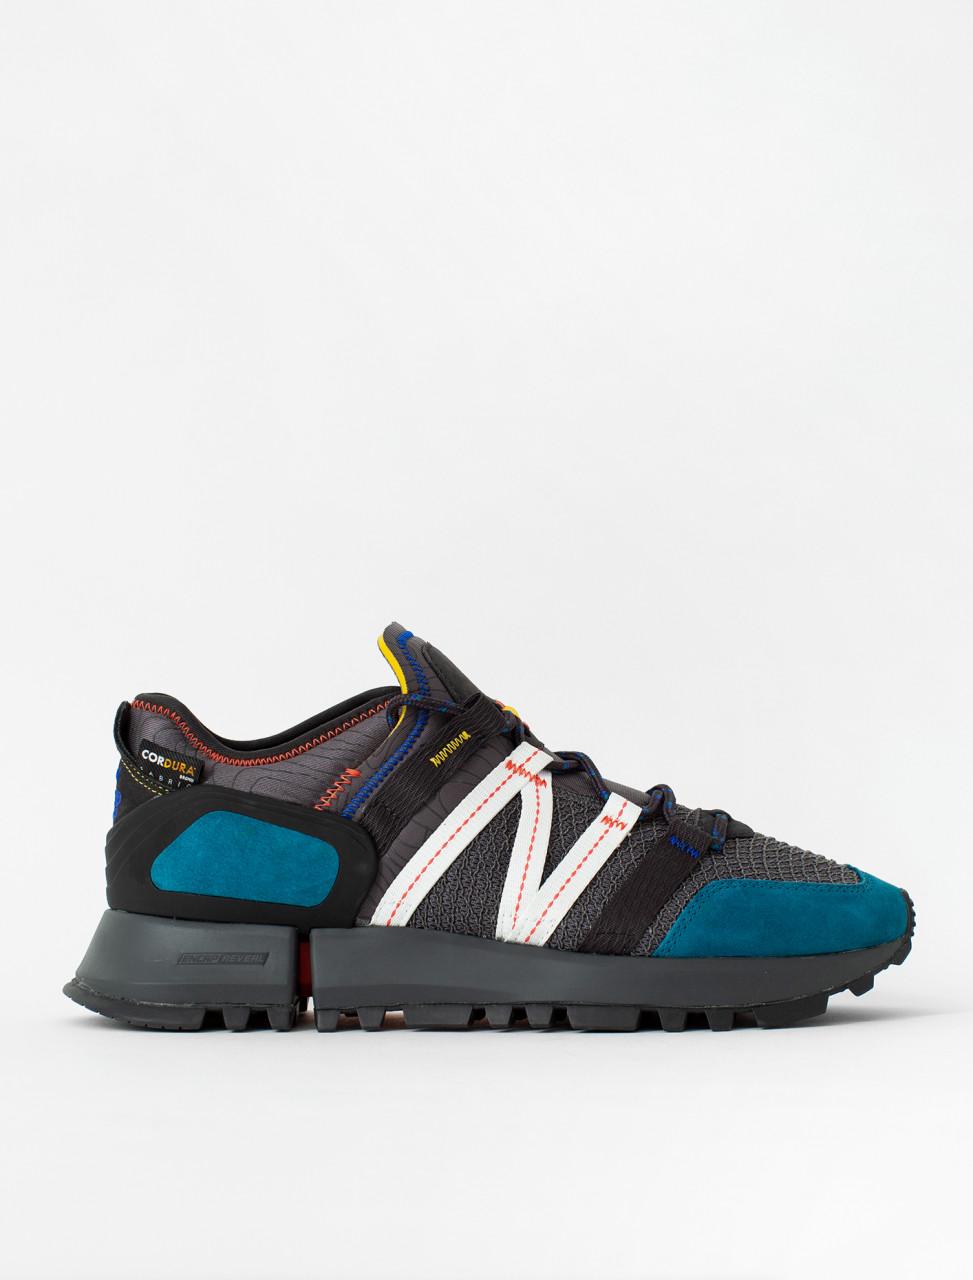 New Balance x Tokyo Design Studio MSRC4 D Sneaker